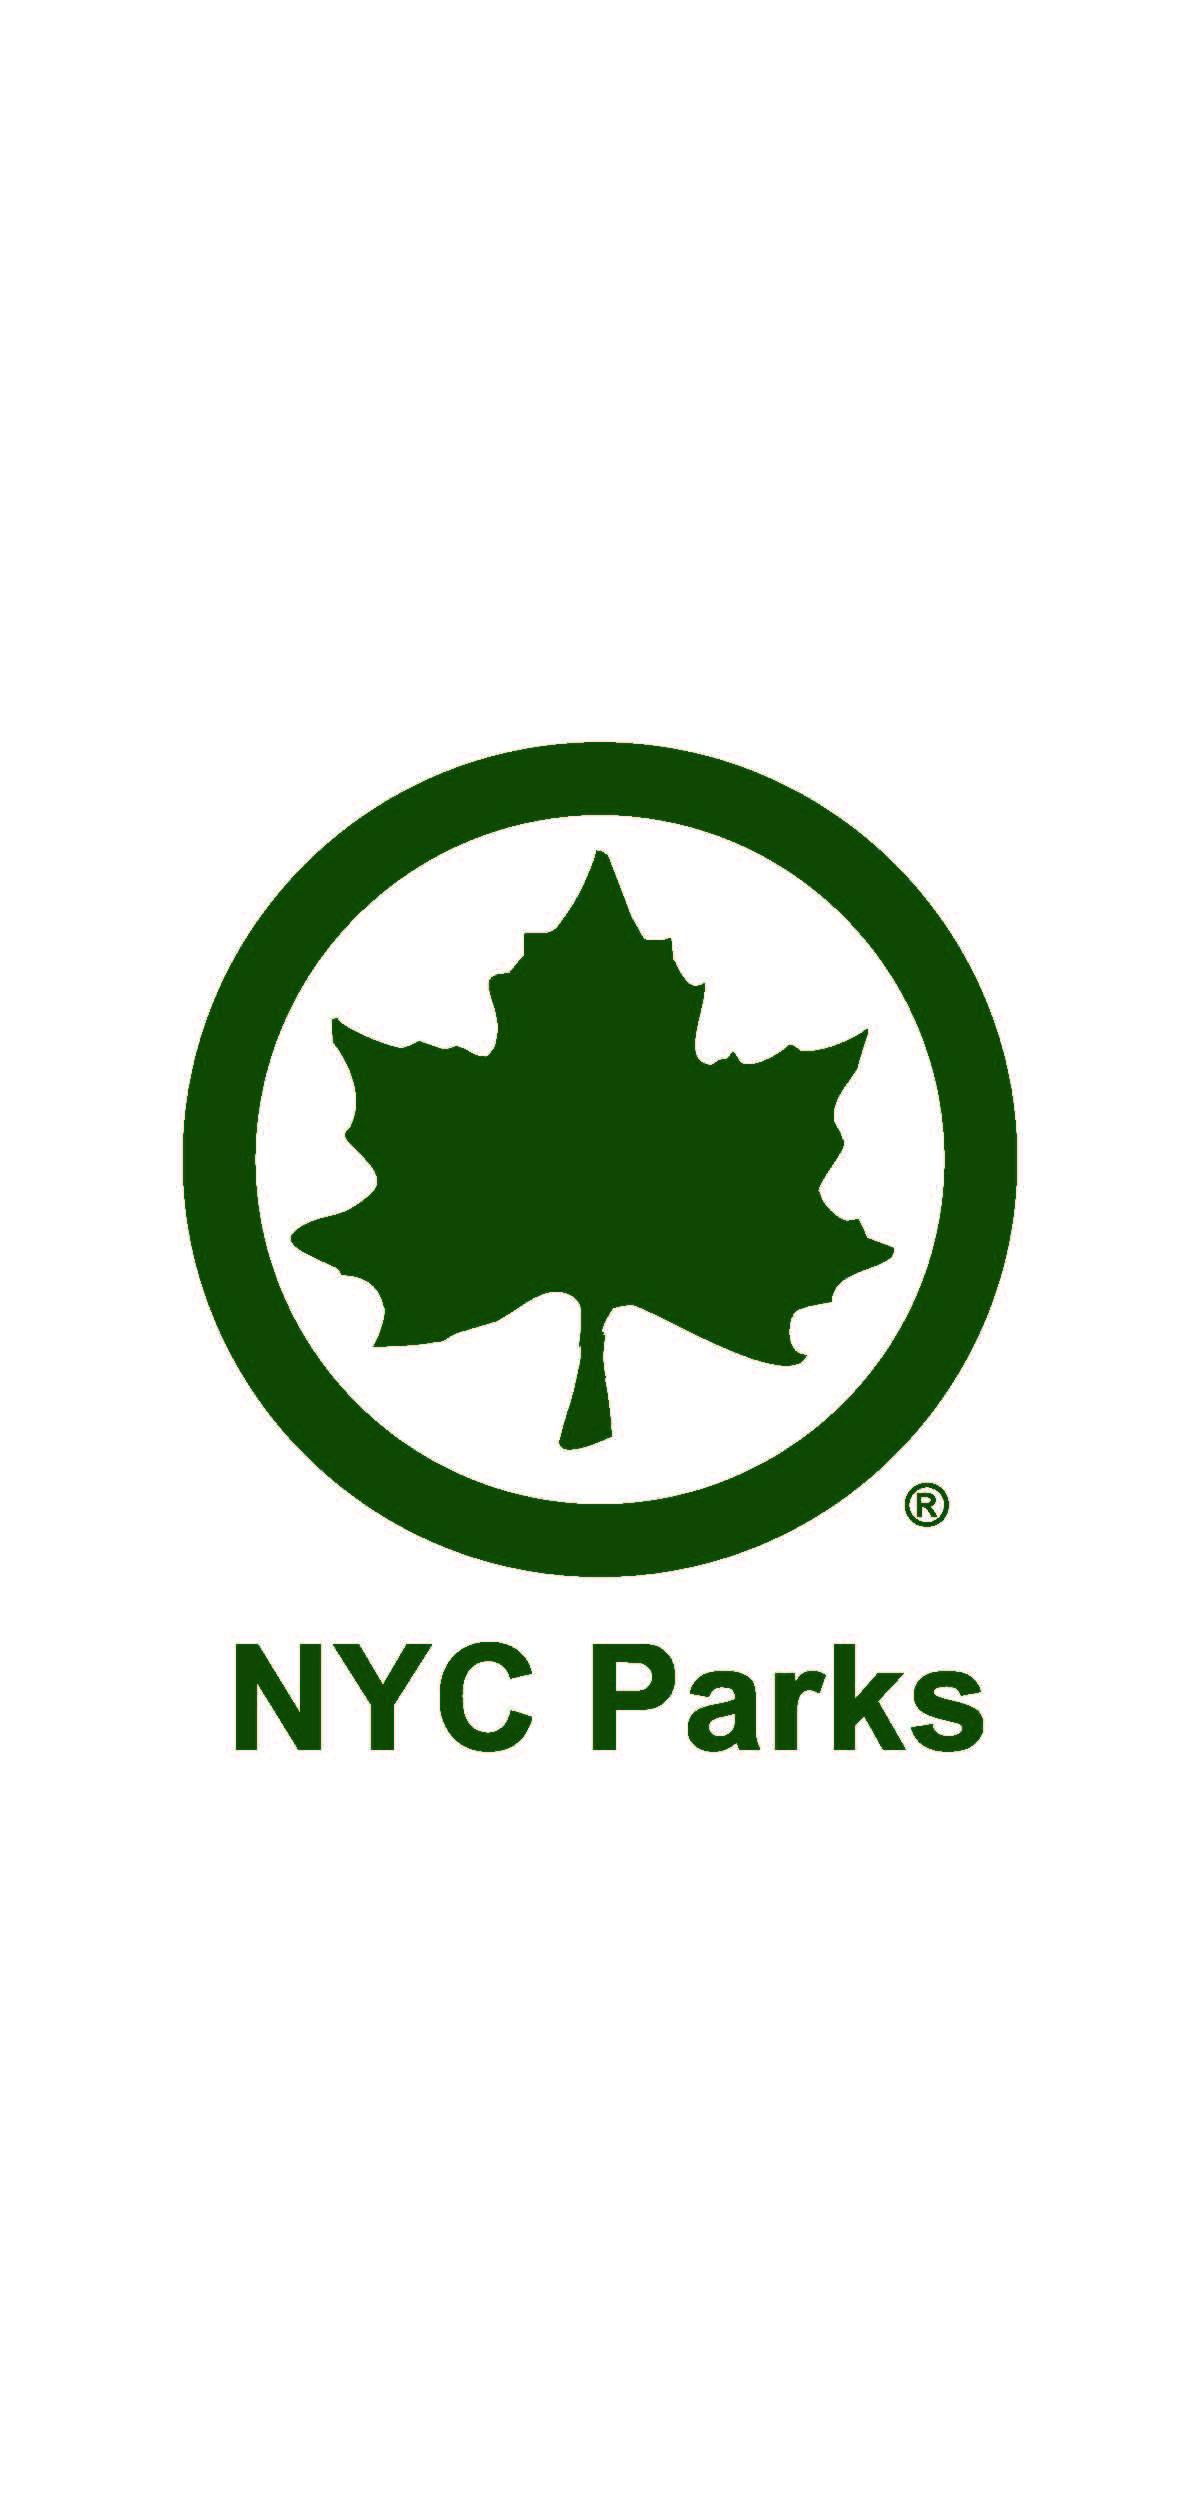 00497-NYC-Parks_24x50_V1-PROOF